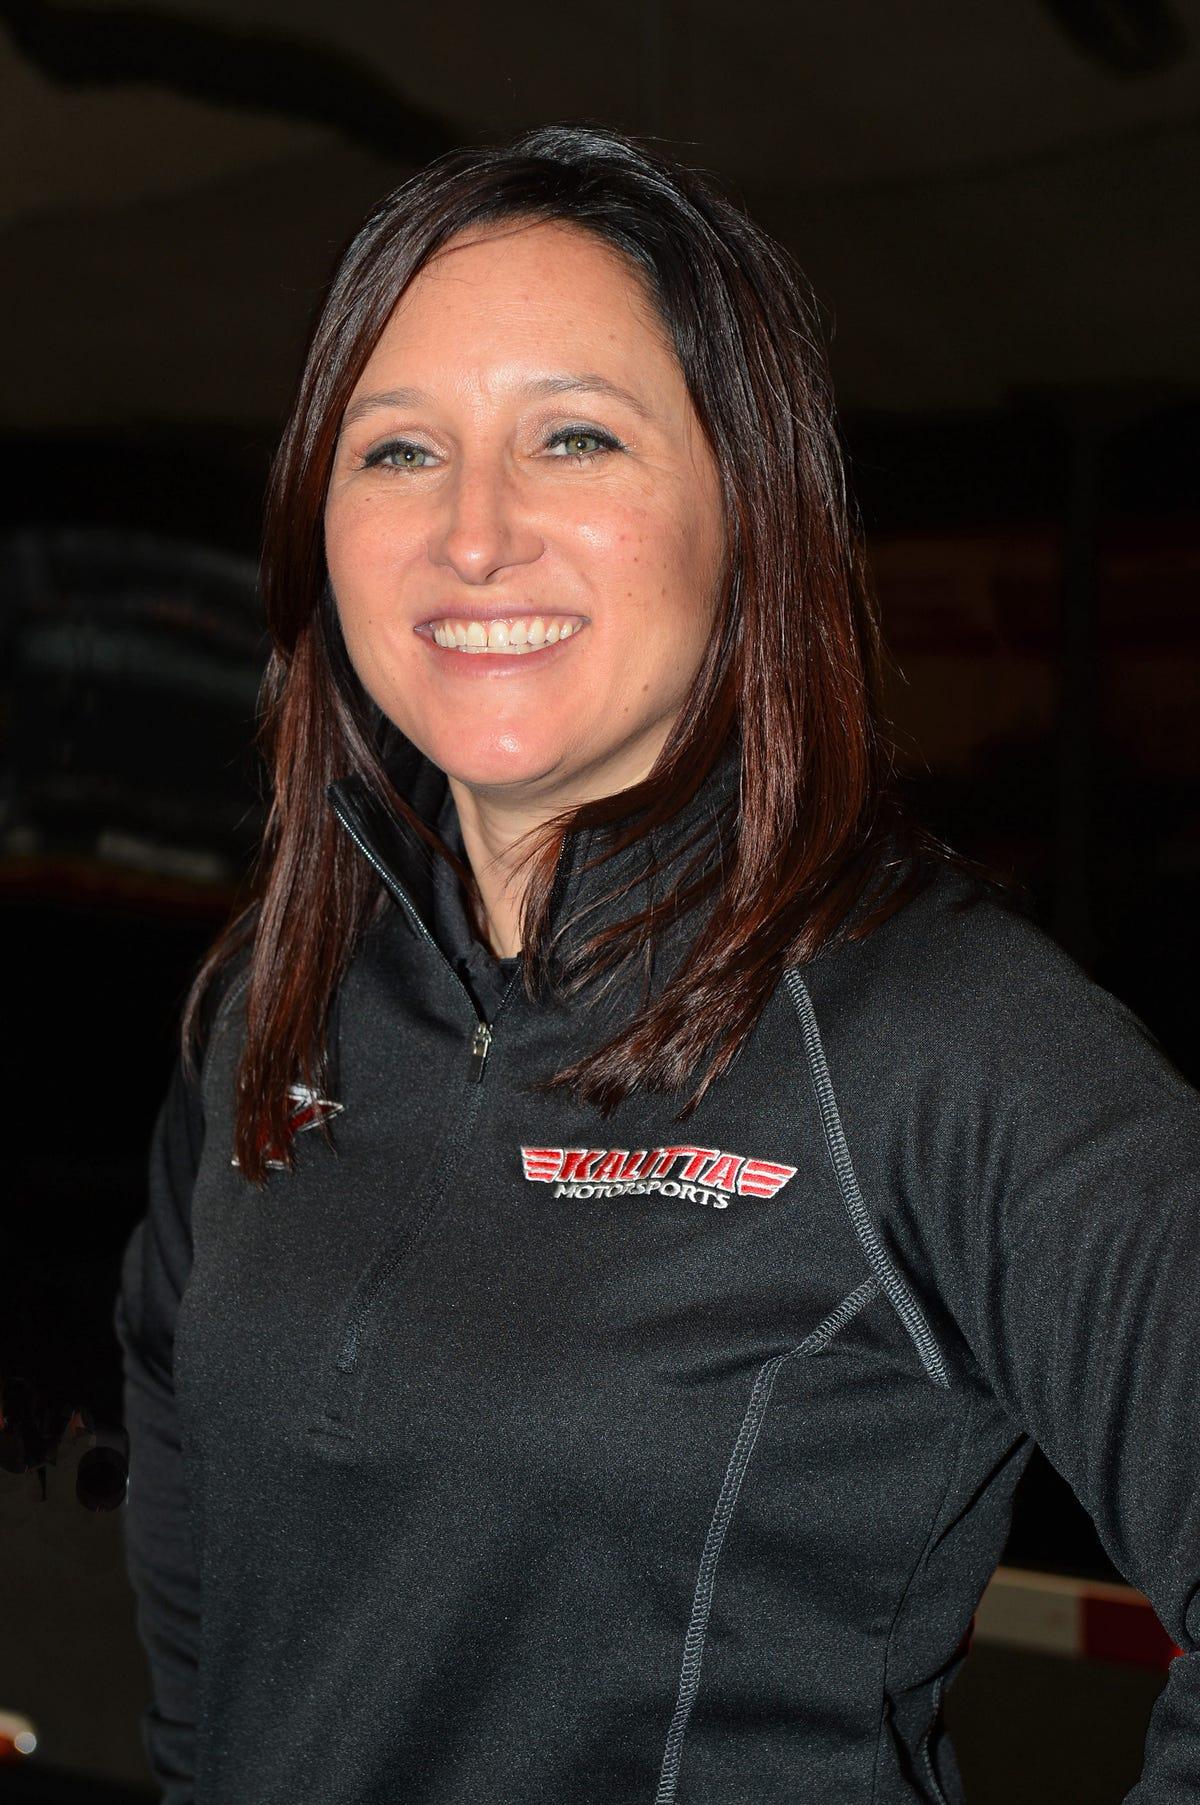 Arizona Nationals: Rachel DeLago making history as an NHRA GM